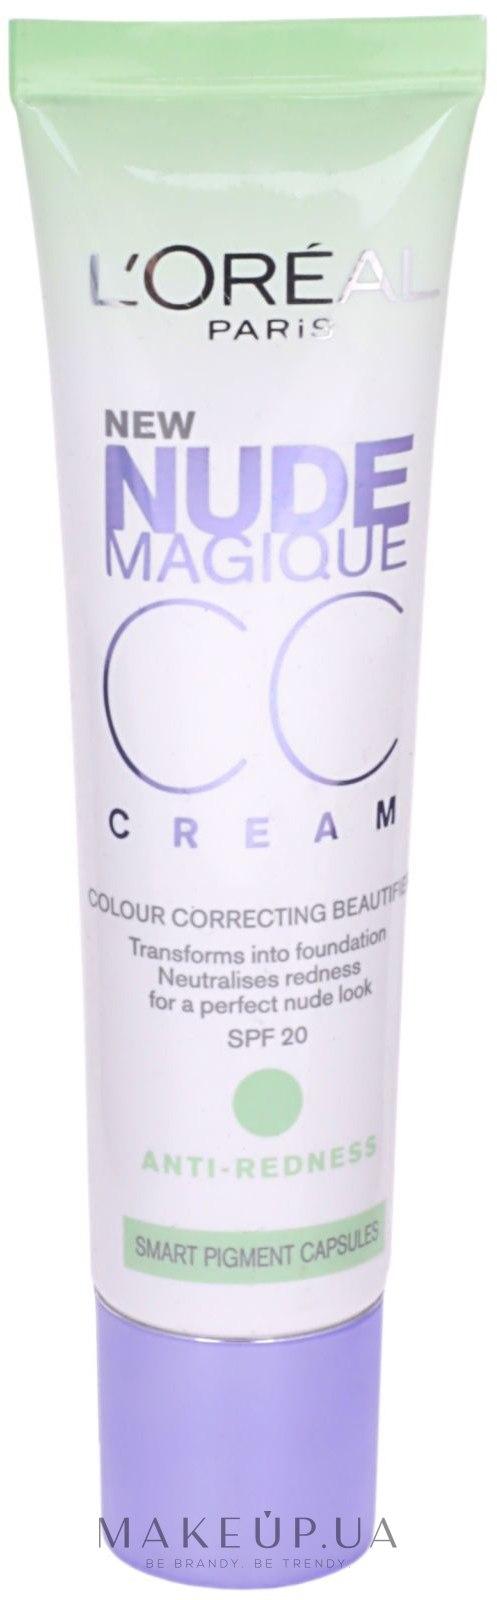 LOréal Paris Cosmetics Nude Magique CC Cream - Anti